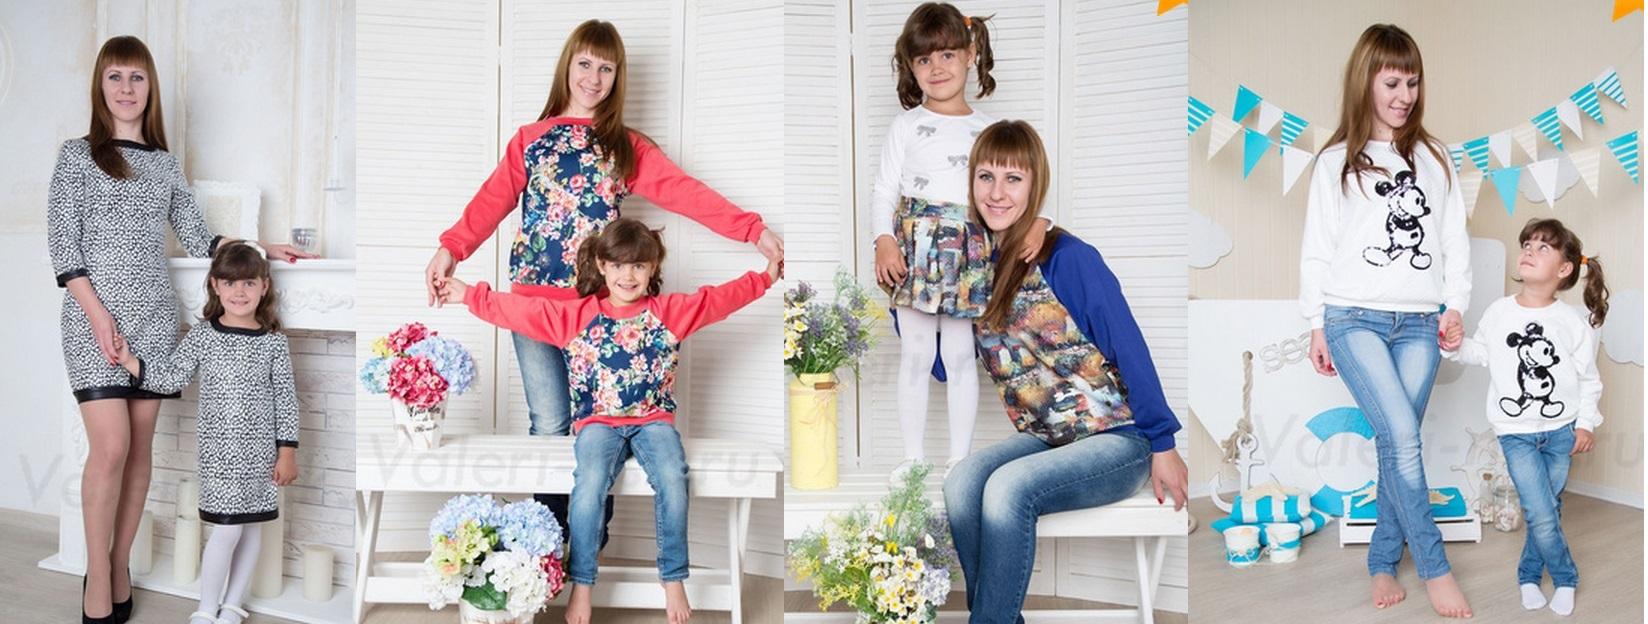 NEW! Like Me - одежда в стиле family look (семейном стиле) - для девочек и их мам.